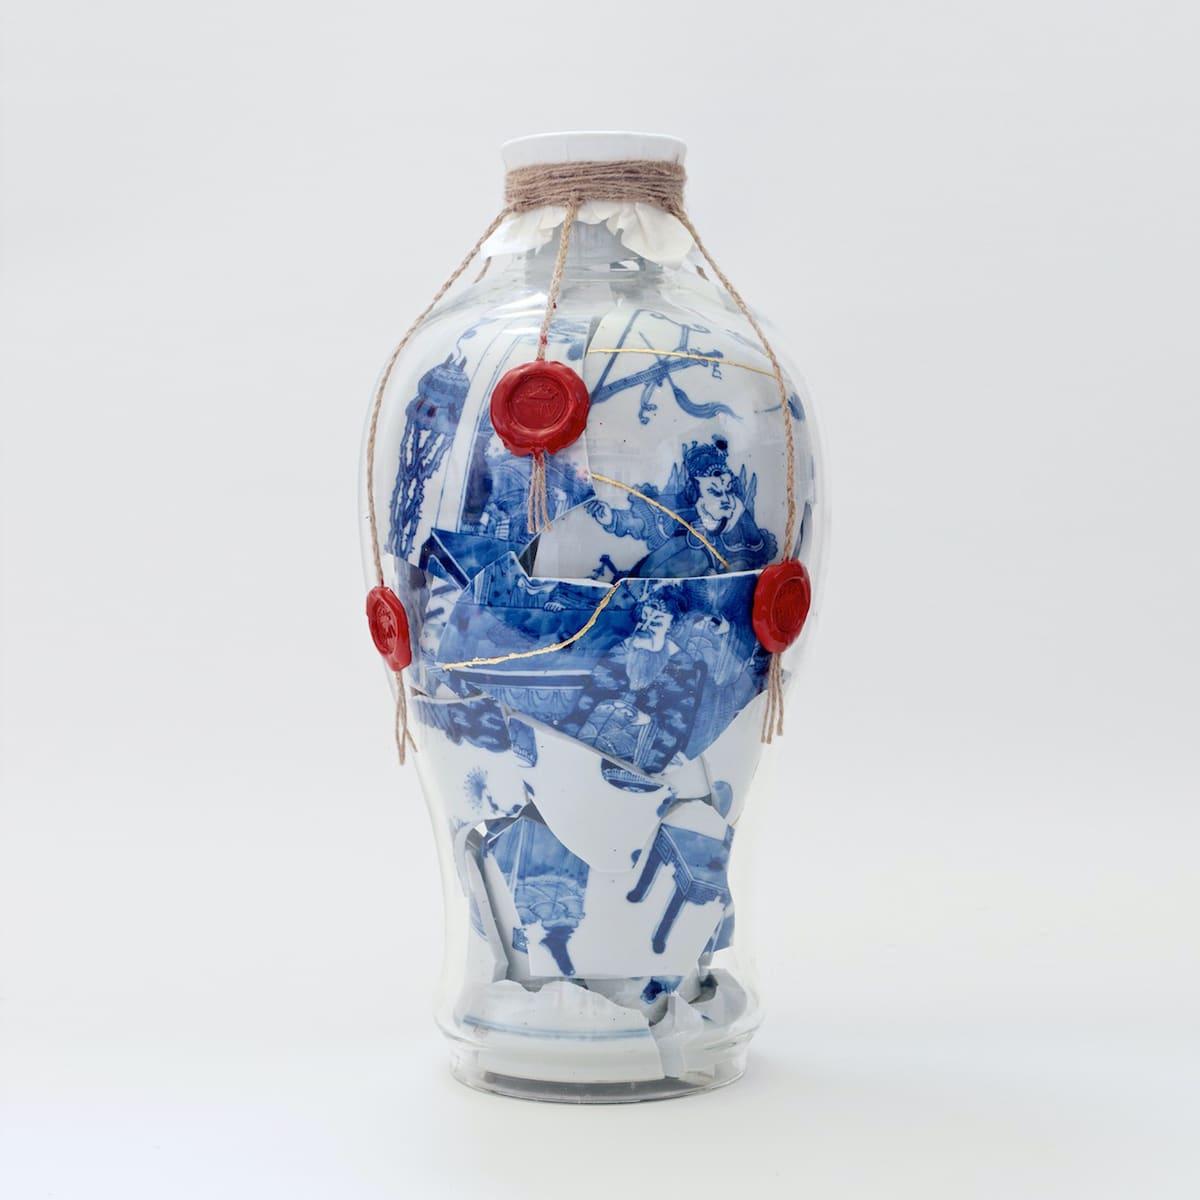 Bouke de Vries Memory Vessel LXVII Fragmented Qing Dynasty Porcelain Sculpture